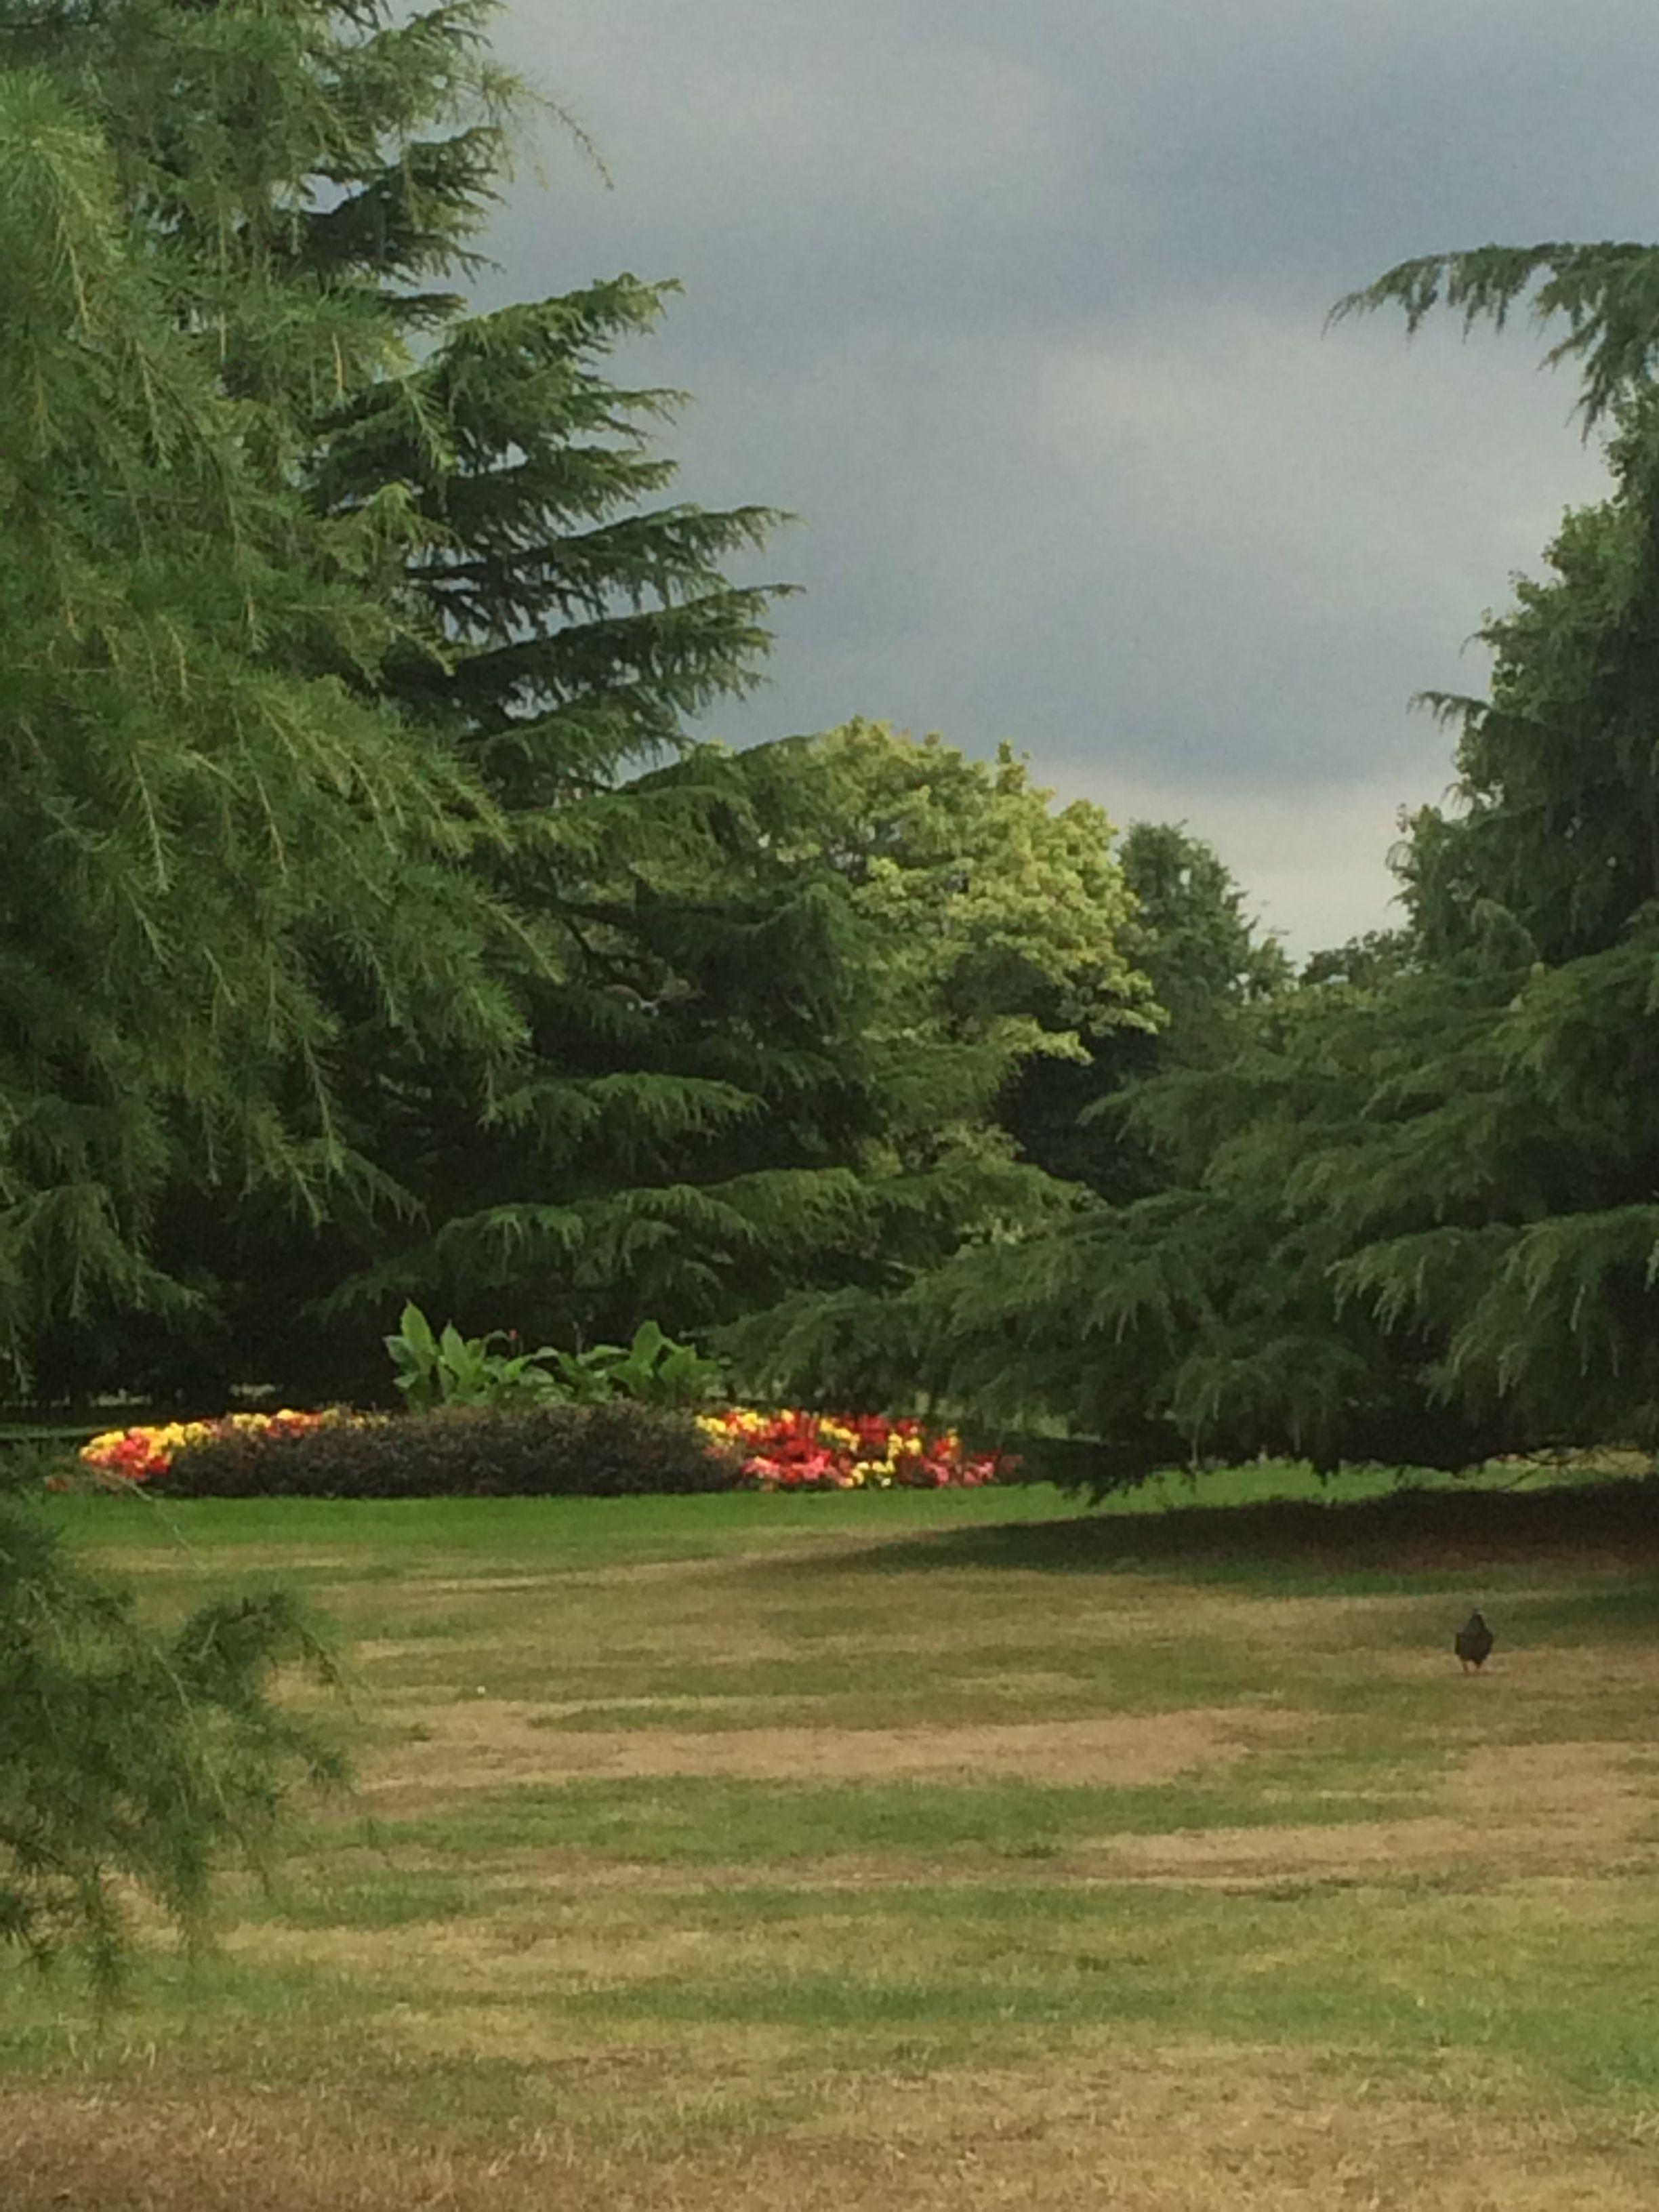 Flower garden royal Greenwich park blackheath London